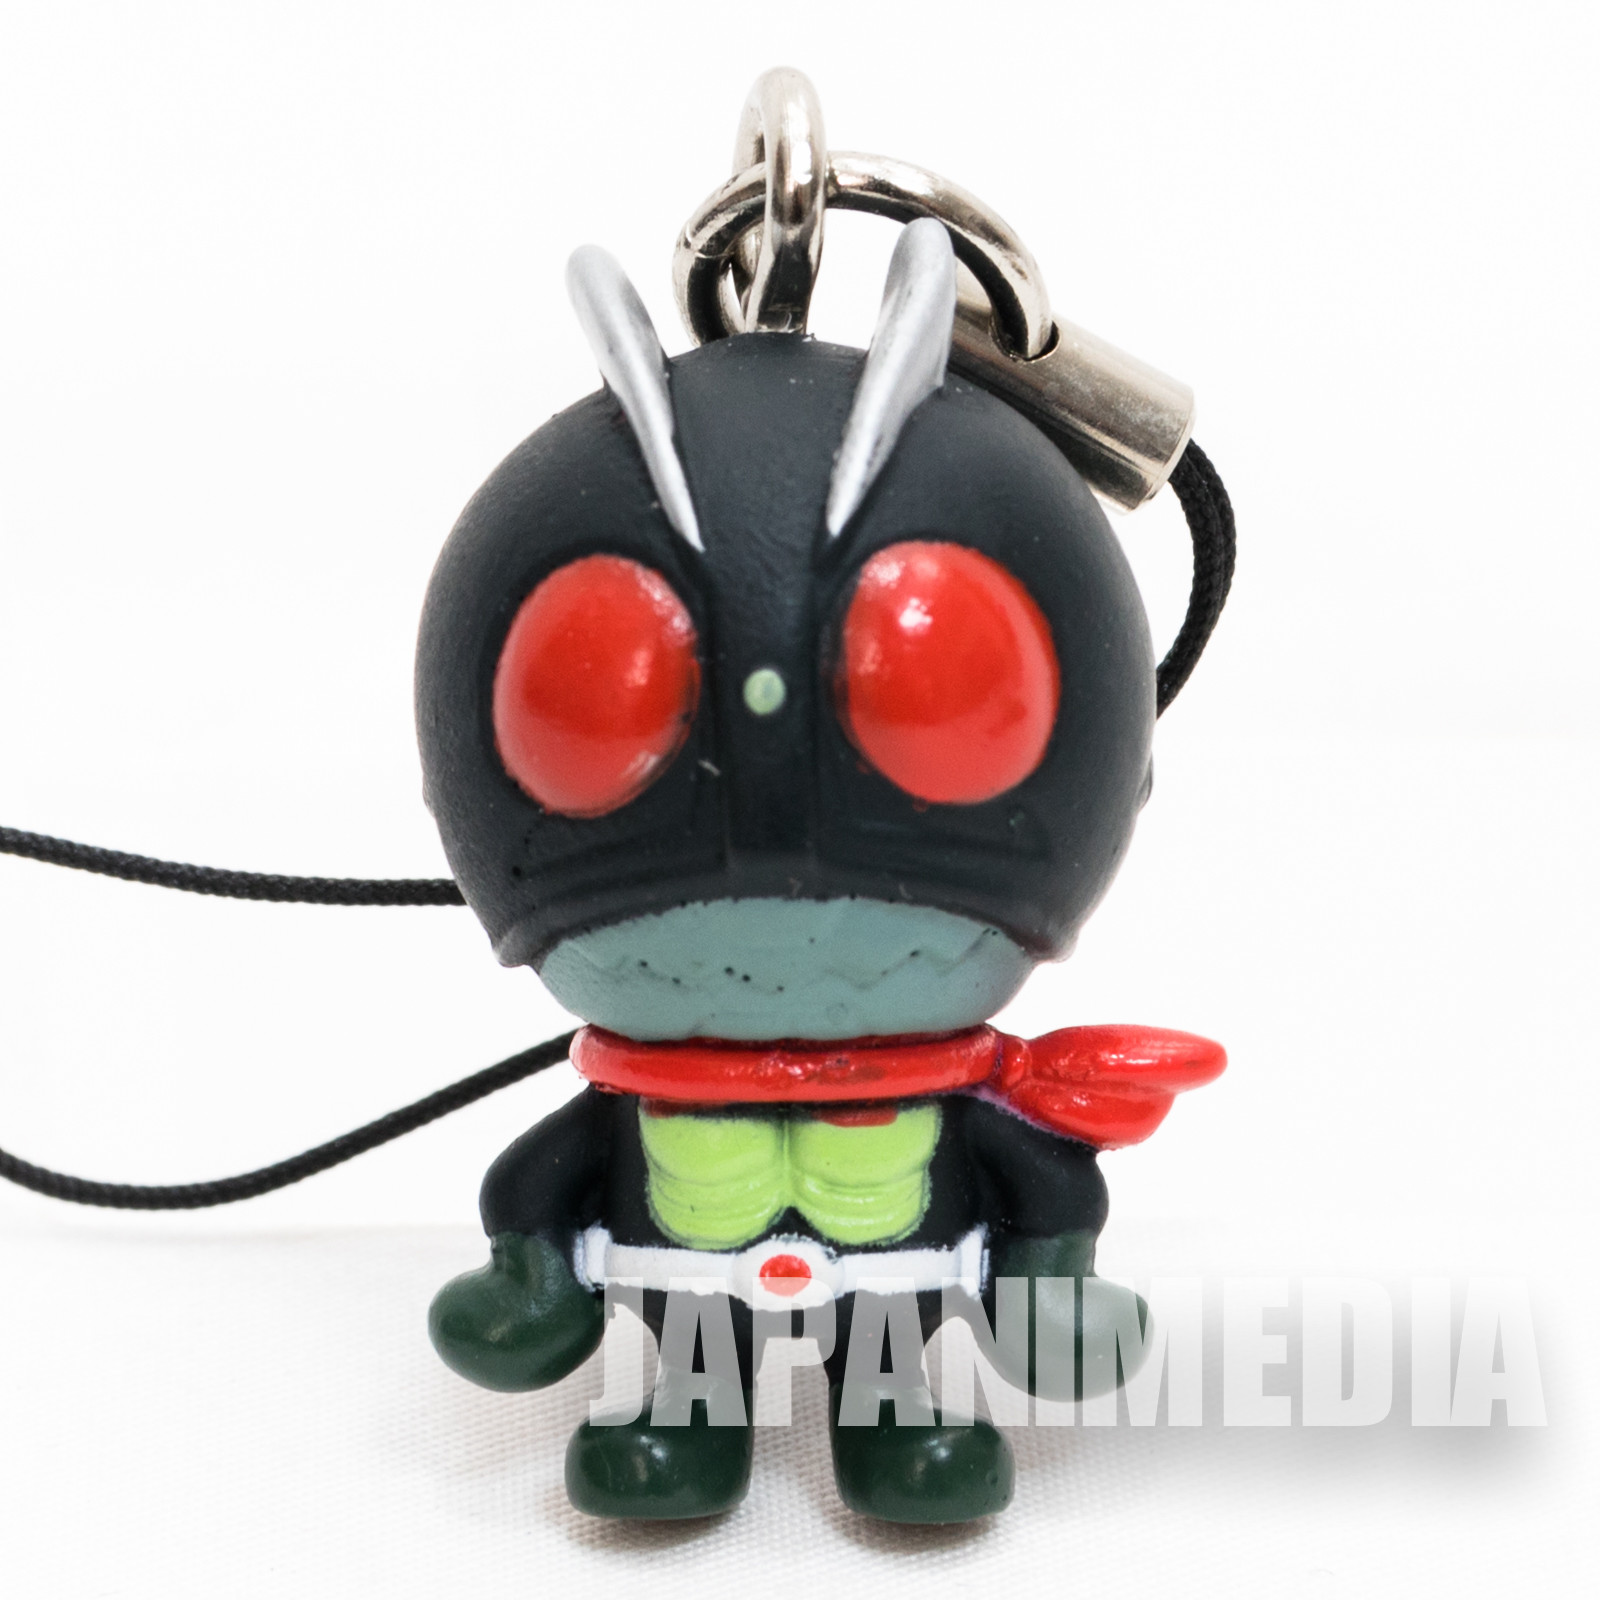 Masked Kamen Rider 1 x Panson Works Figure Strap Shotaro Ishinomori Characters